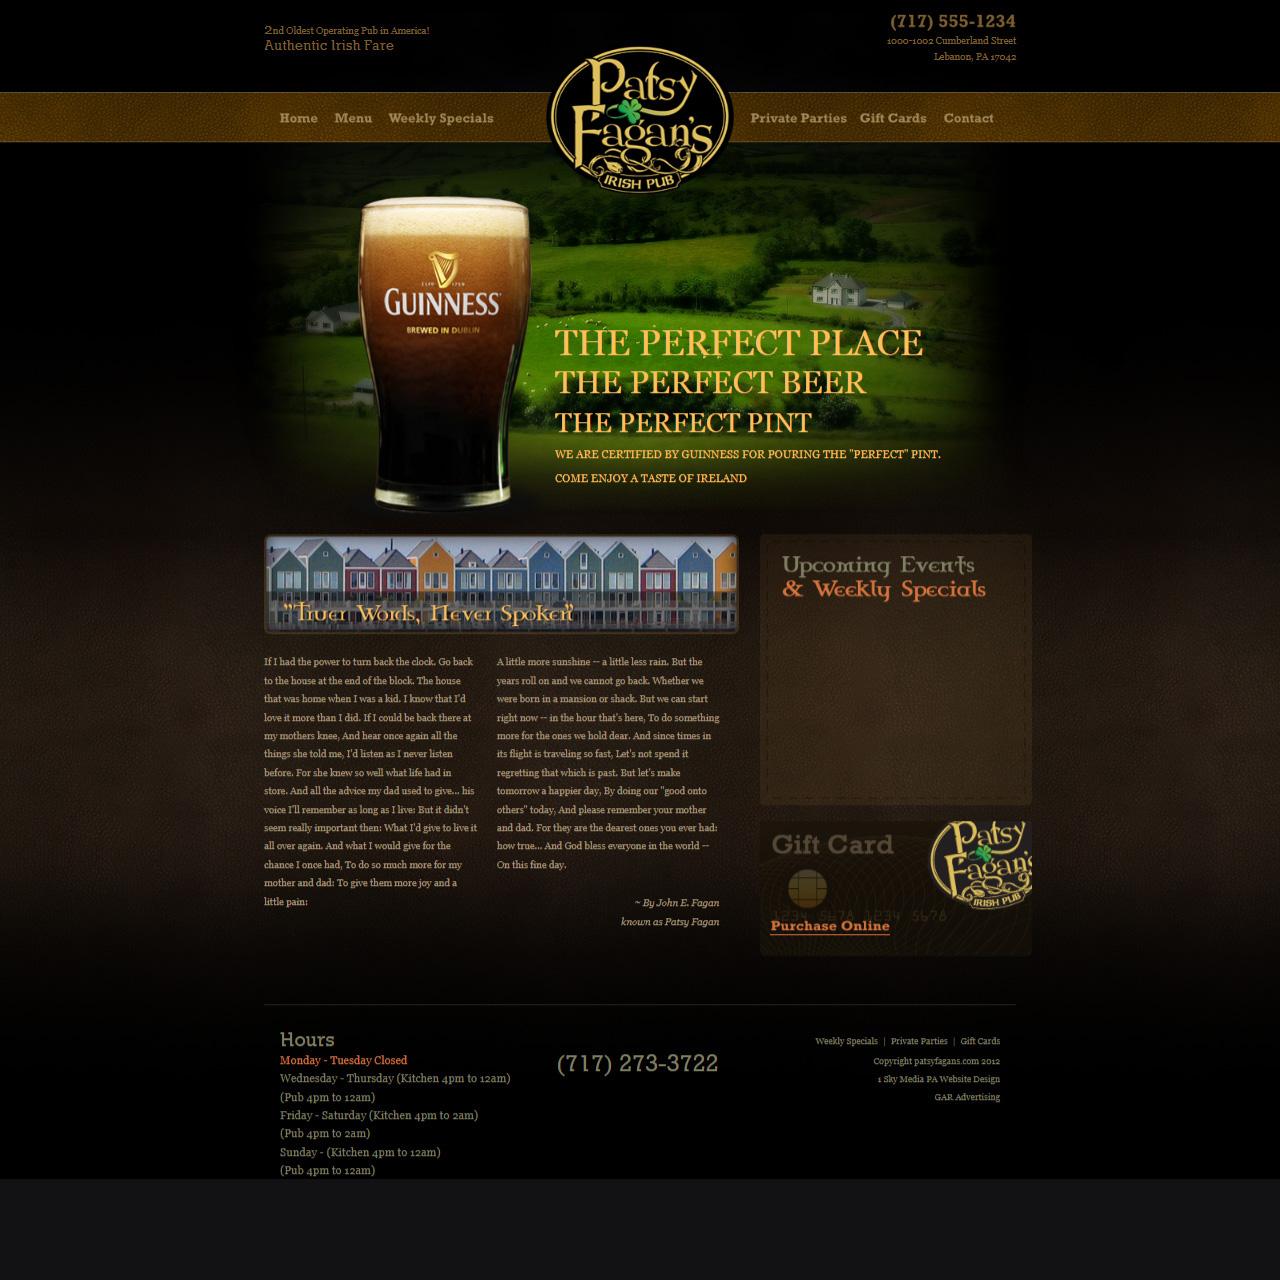 Patsy Fagan Irish Pub website design